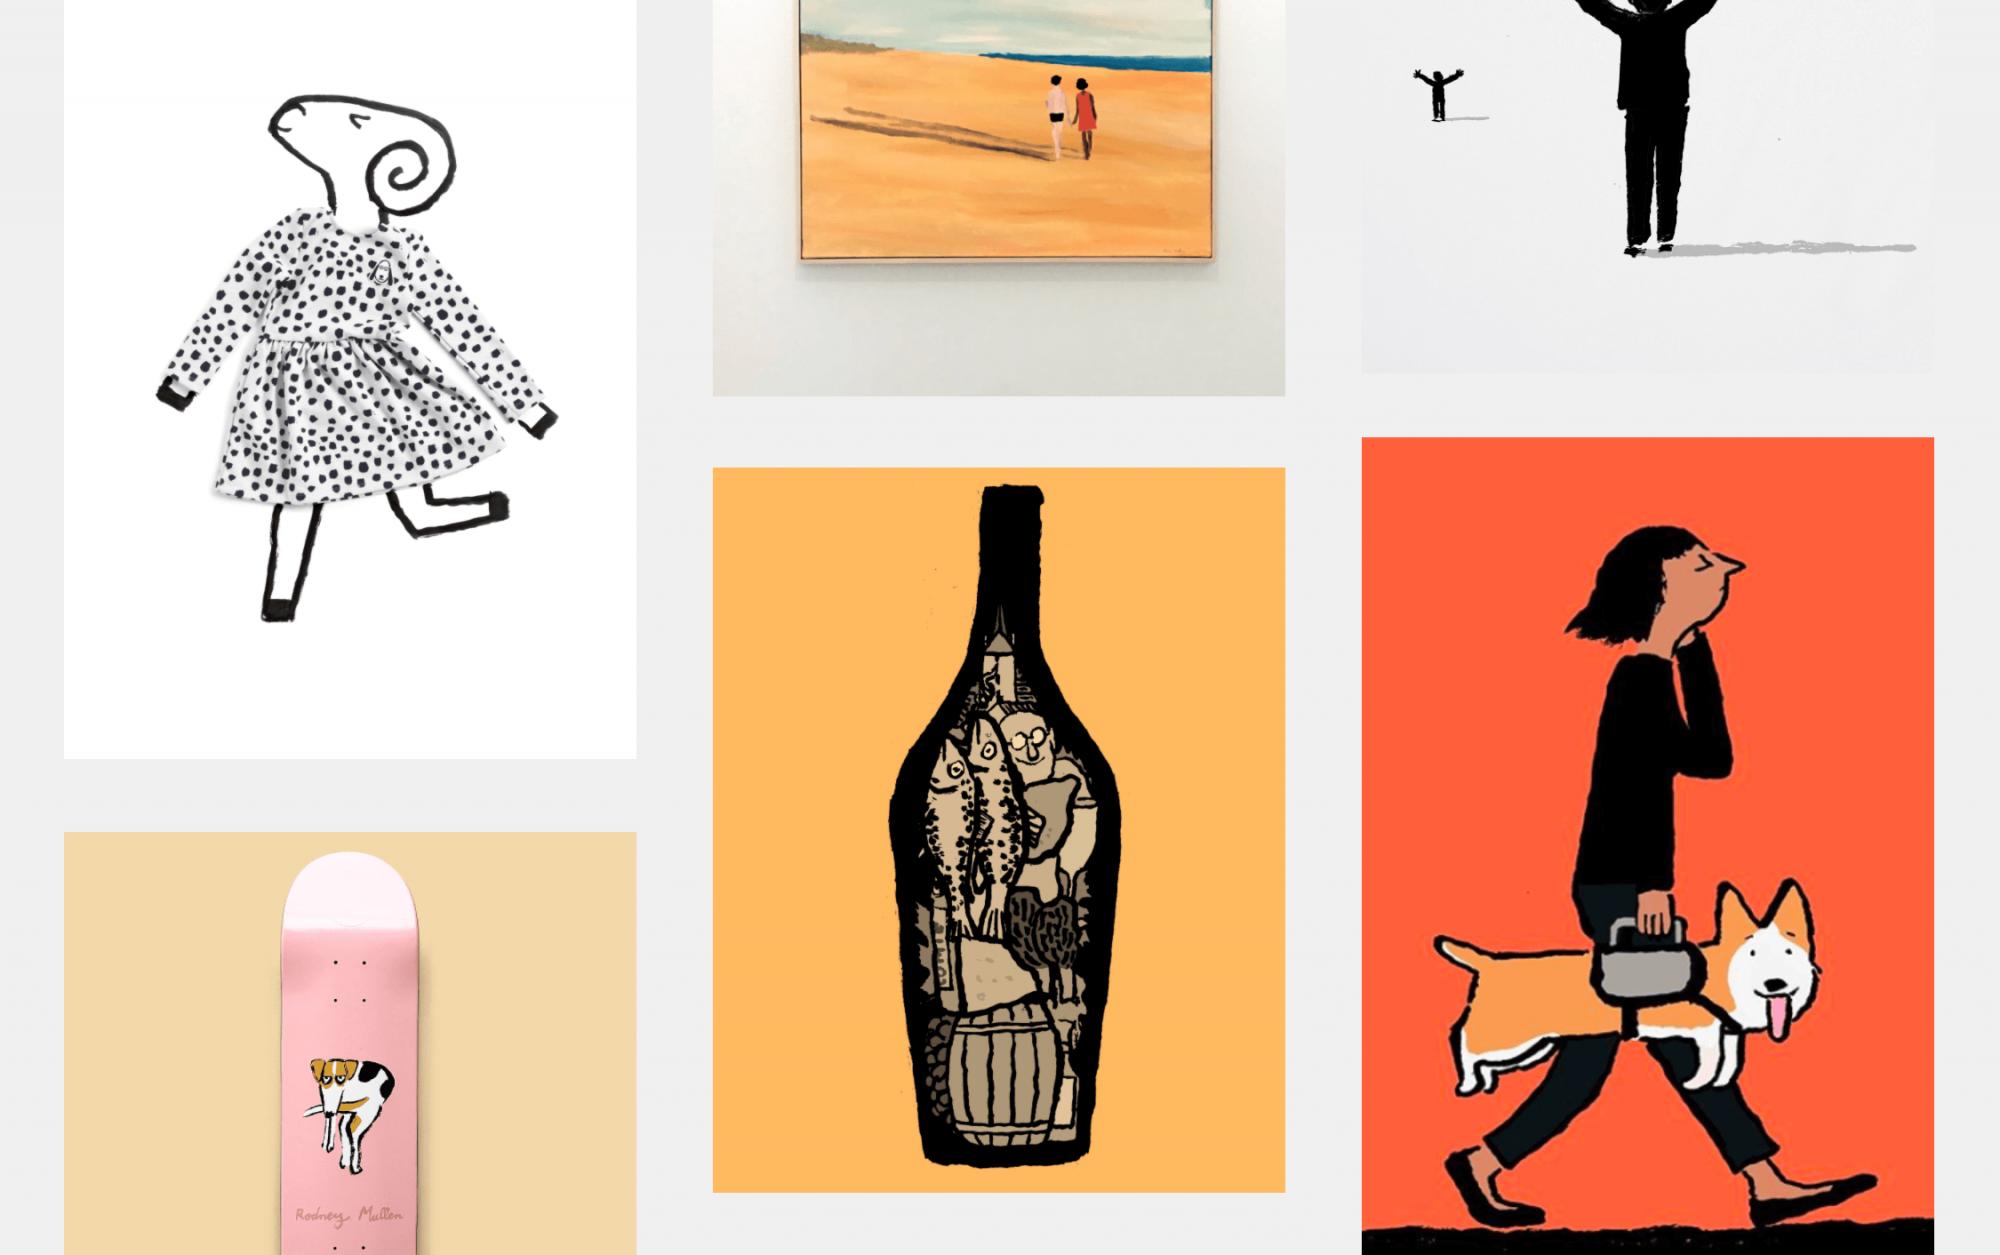 A selection of work by illustrator Jean Jullien